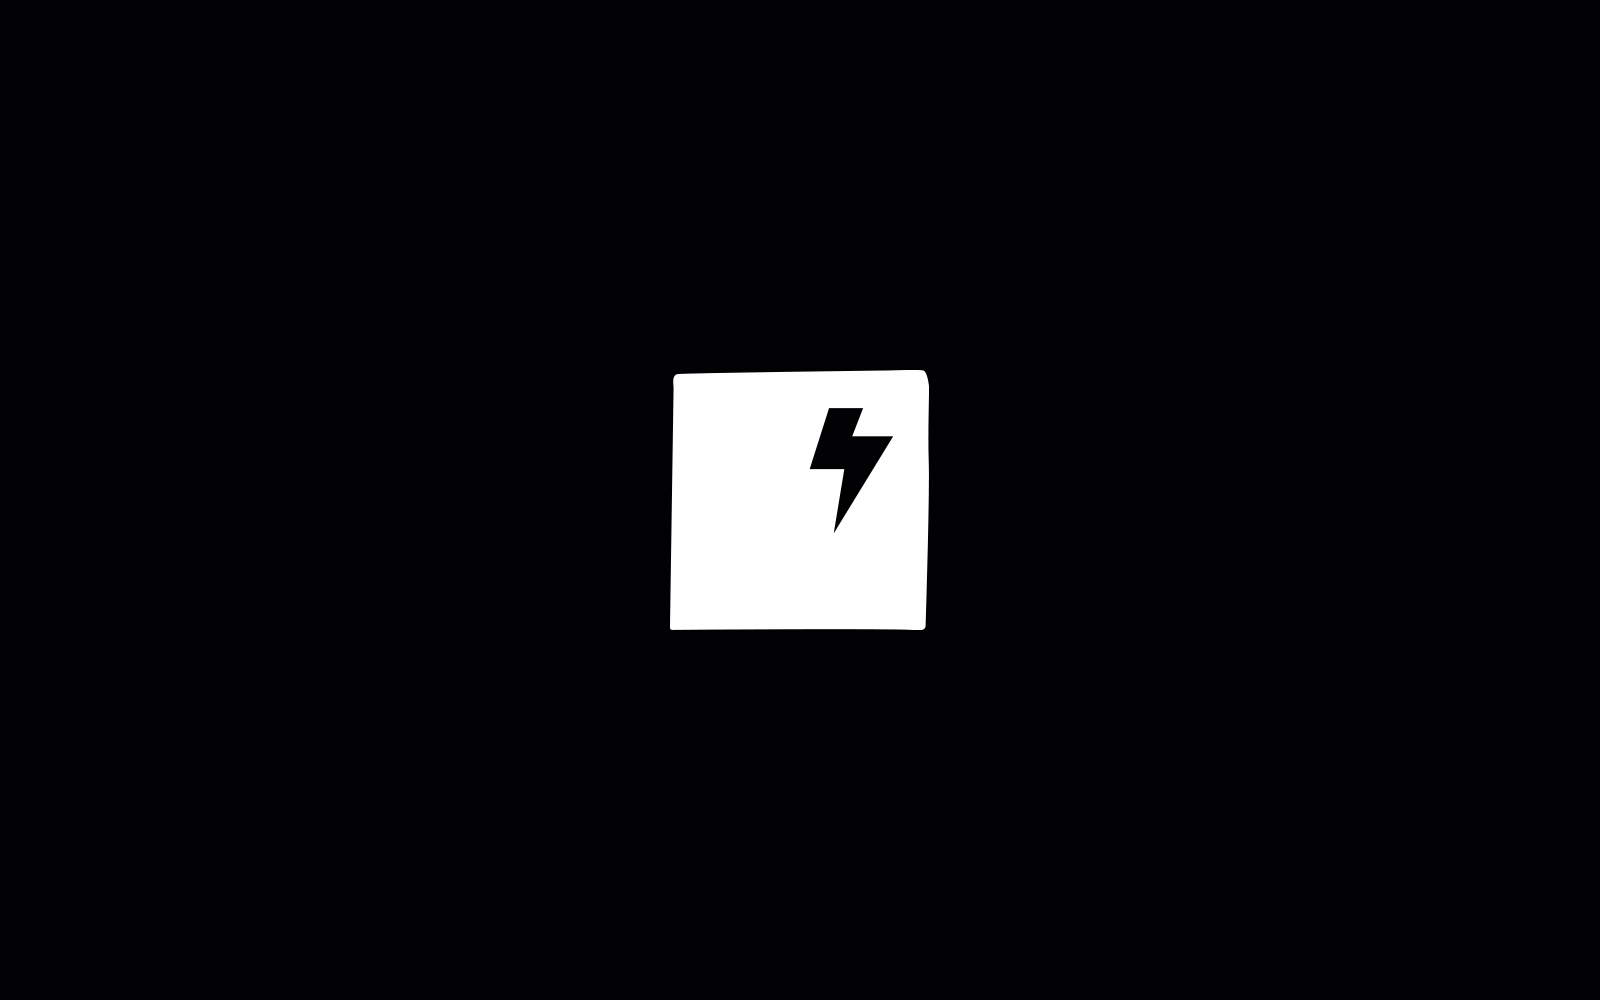 Untold-Icon3.jpg